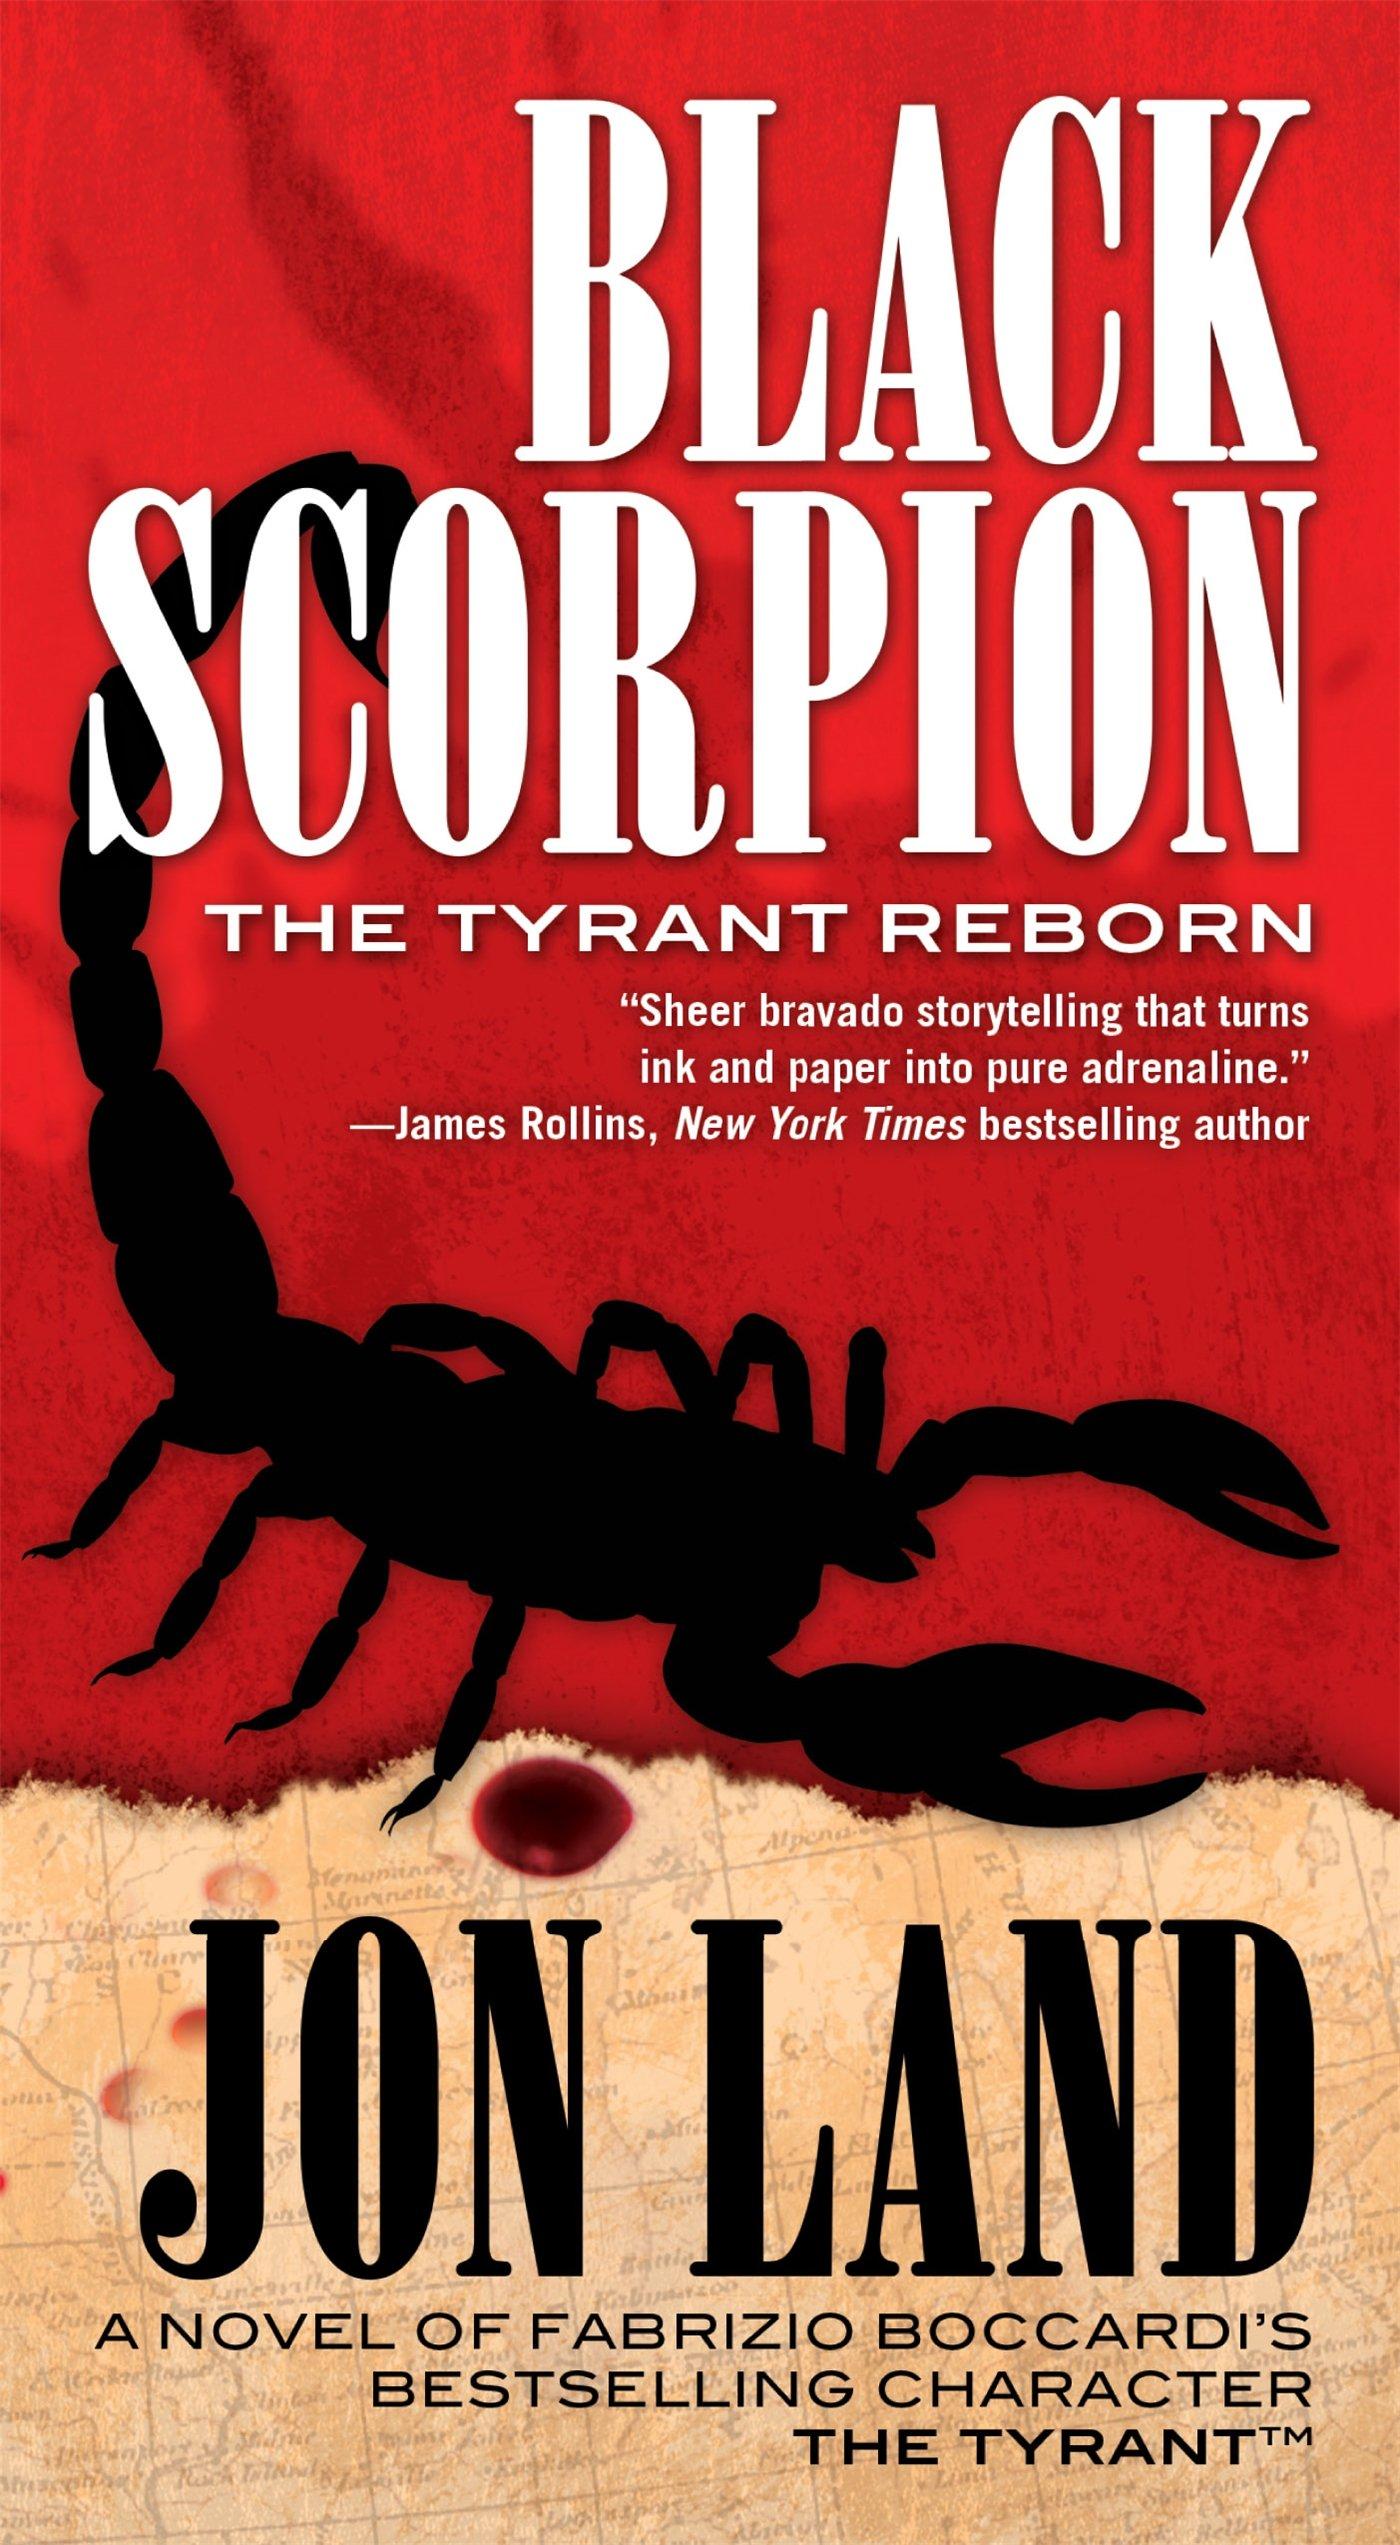 Amazon: Black Scorpion: The Tyrant Reborn (michael Tiranno The Tyrant)  (9780765370914): Jon Land, Fabrizio Boccardi: Books